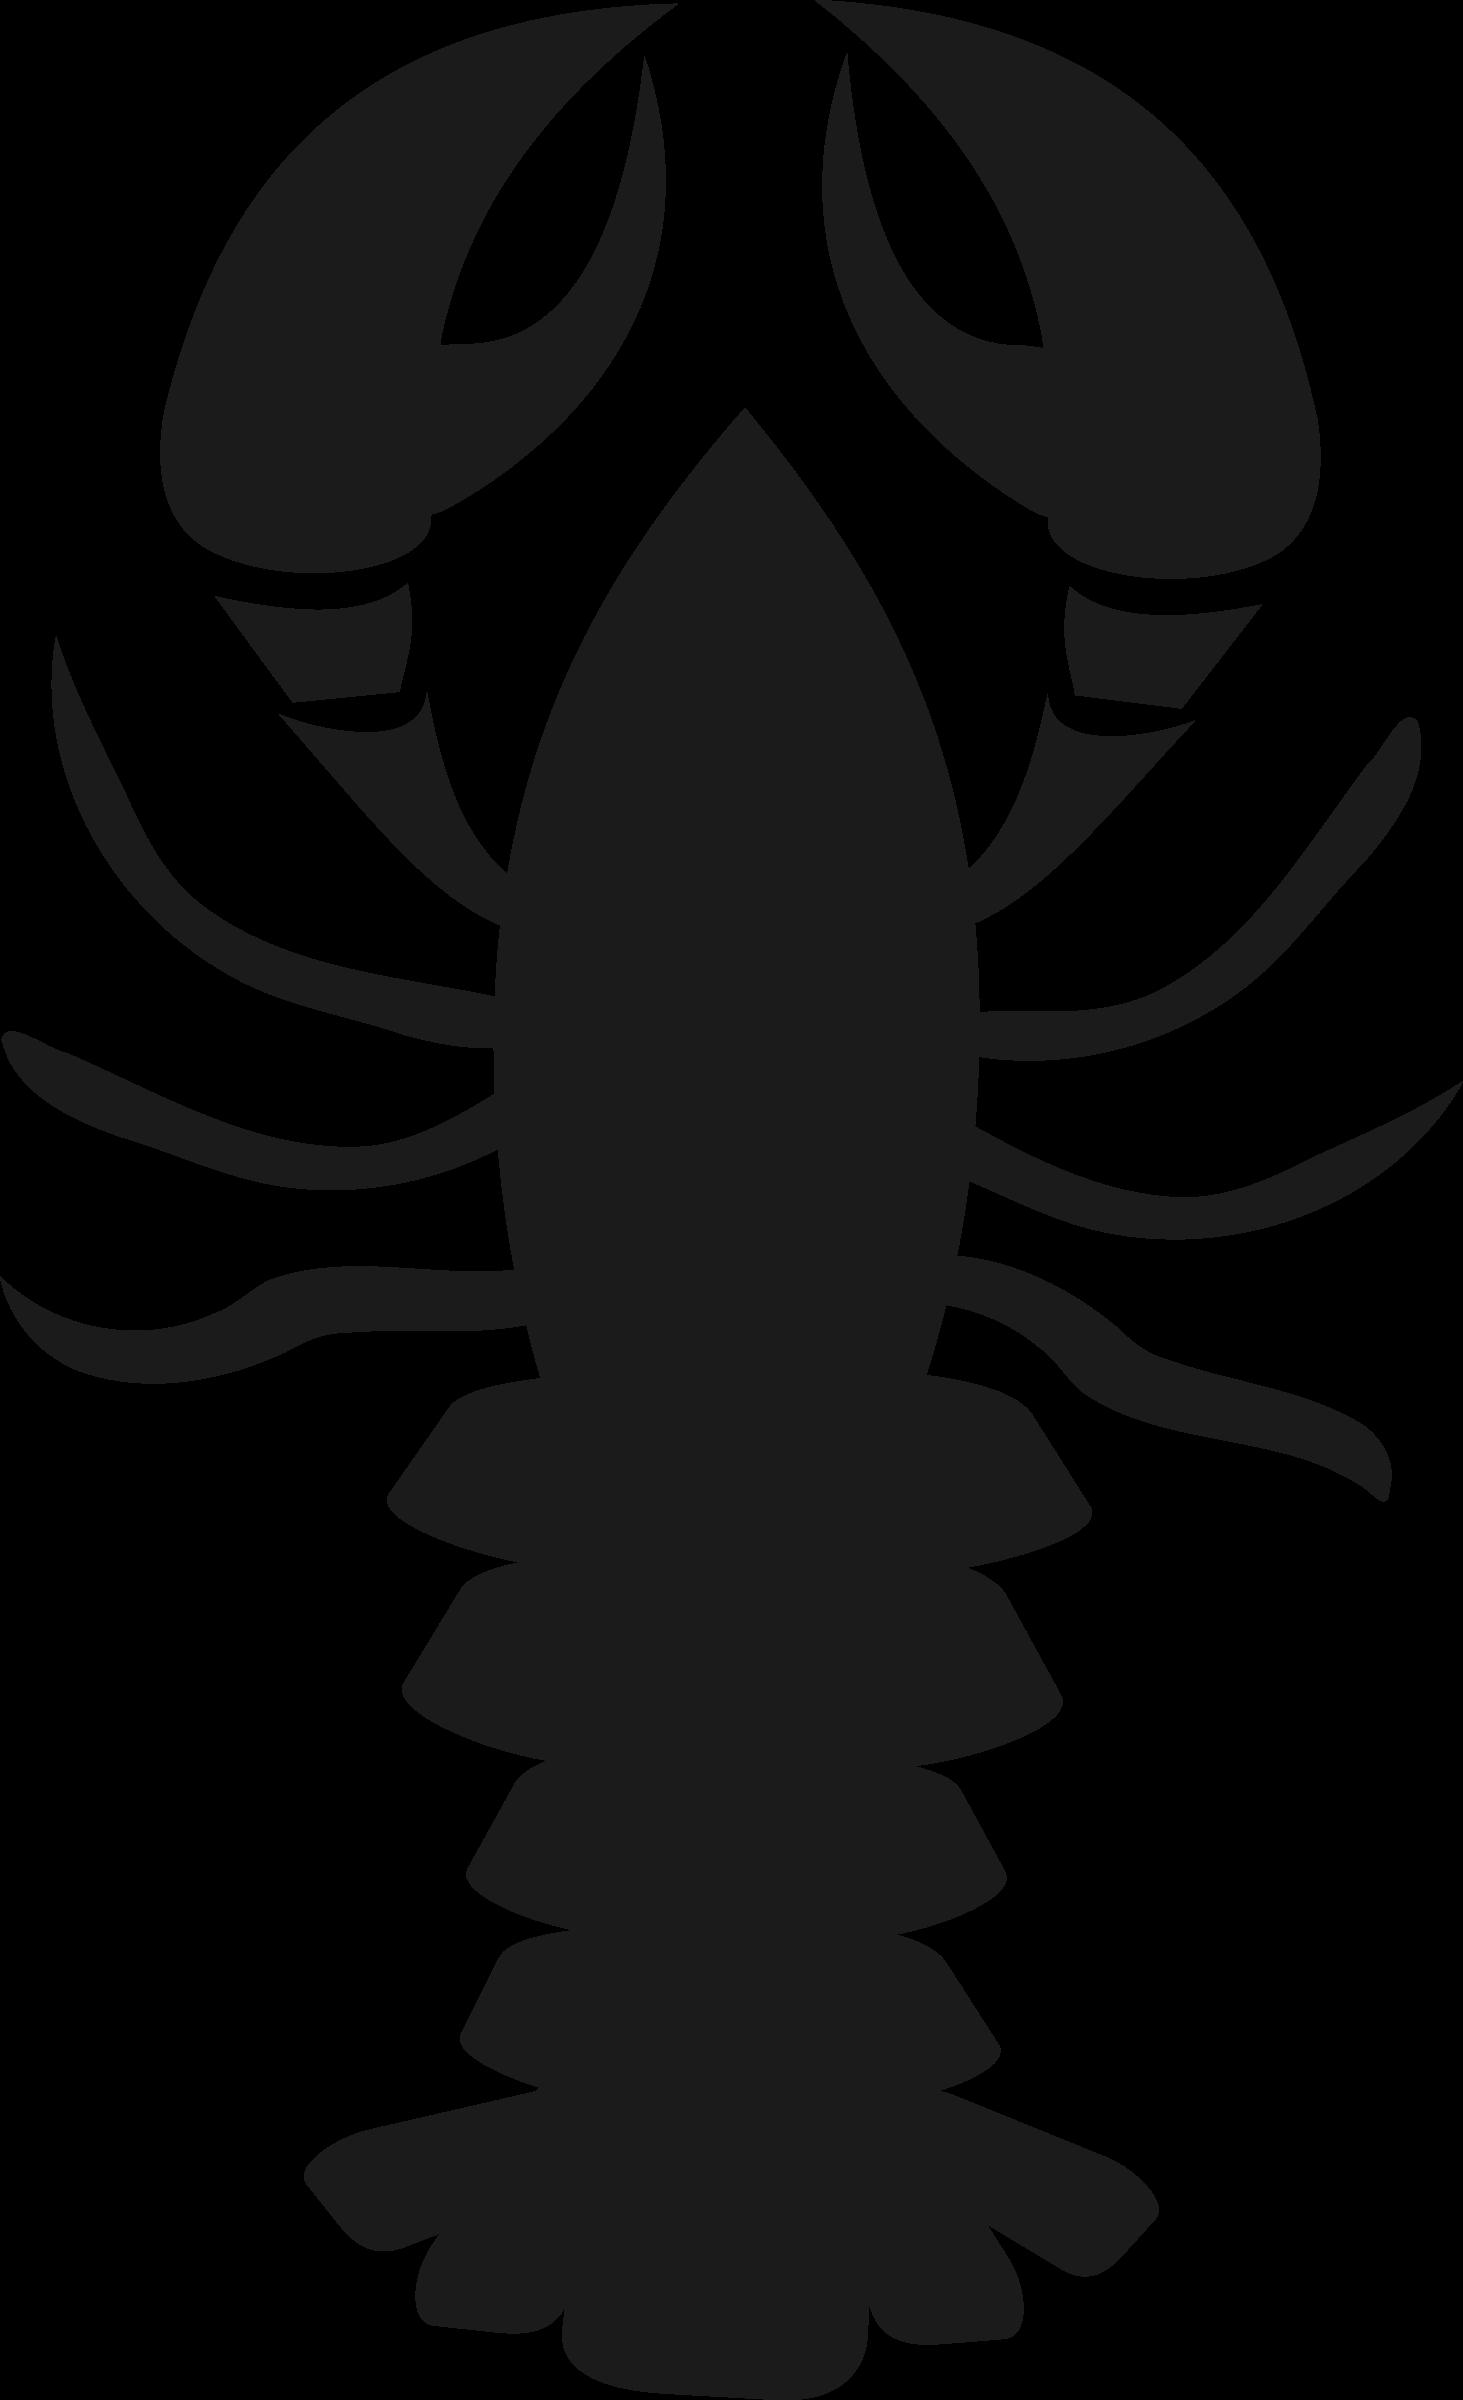 Lobster clipart vintage. Page of clipartblack com